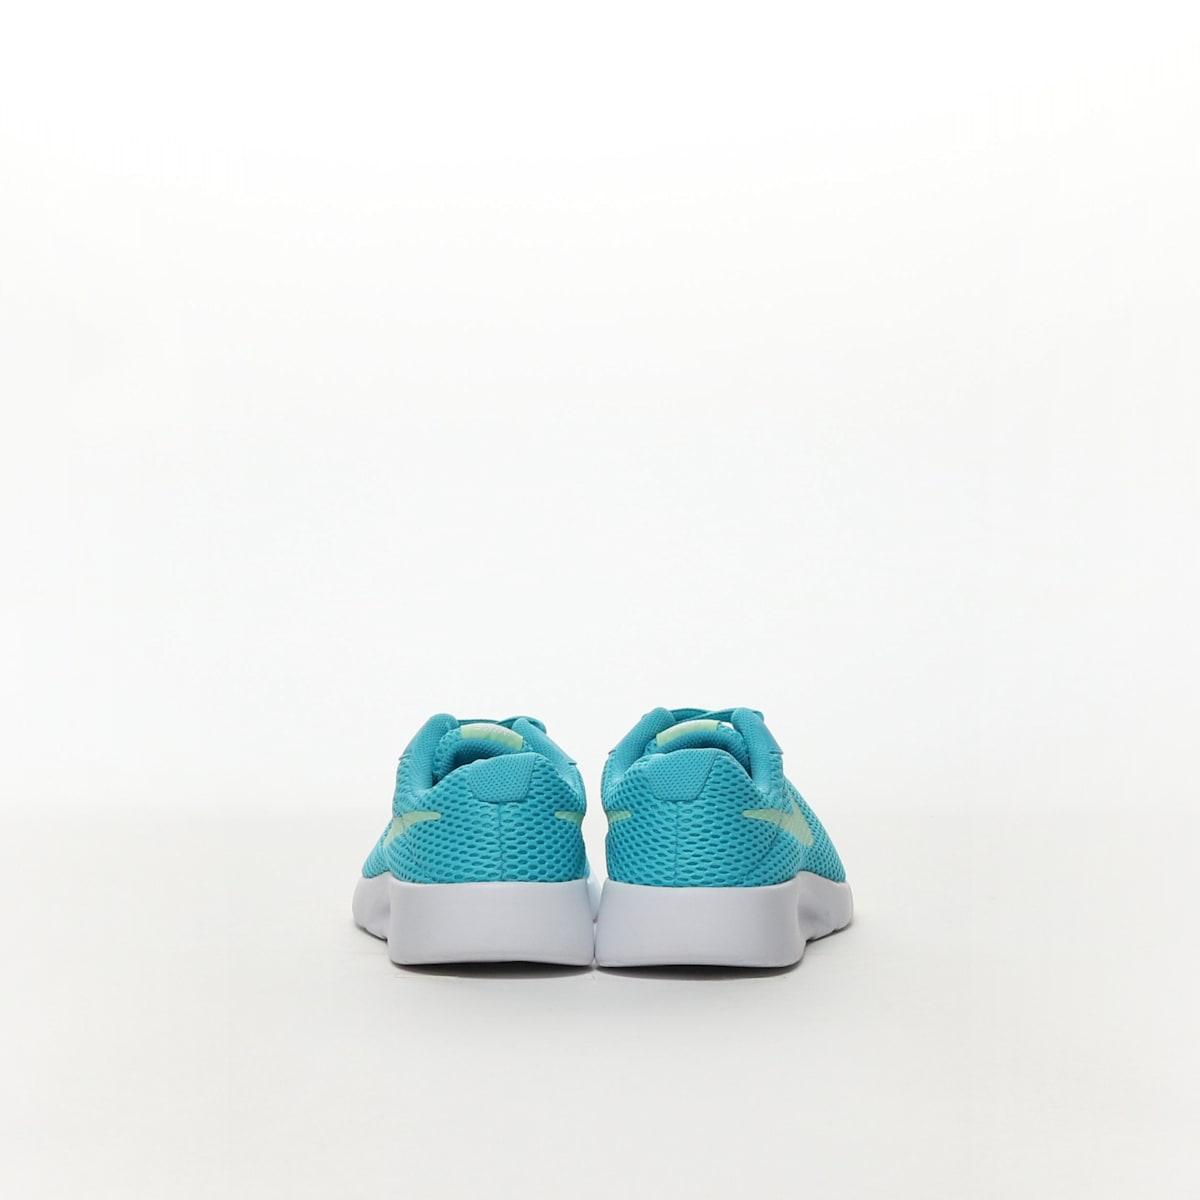 6f7d3624db57 Girls  Nike Tanjun BR (GS) Shoe - CHLORINE BLUE FRESH MINT-WHITE – Resku